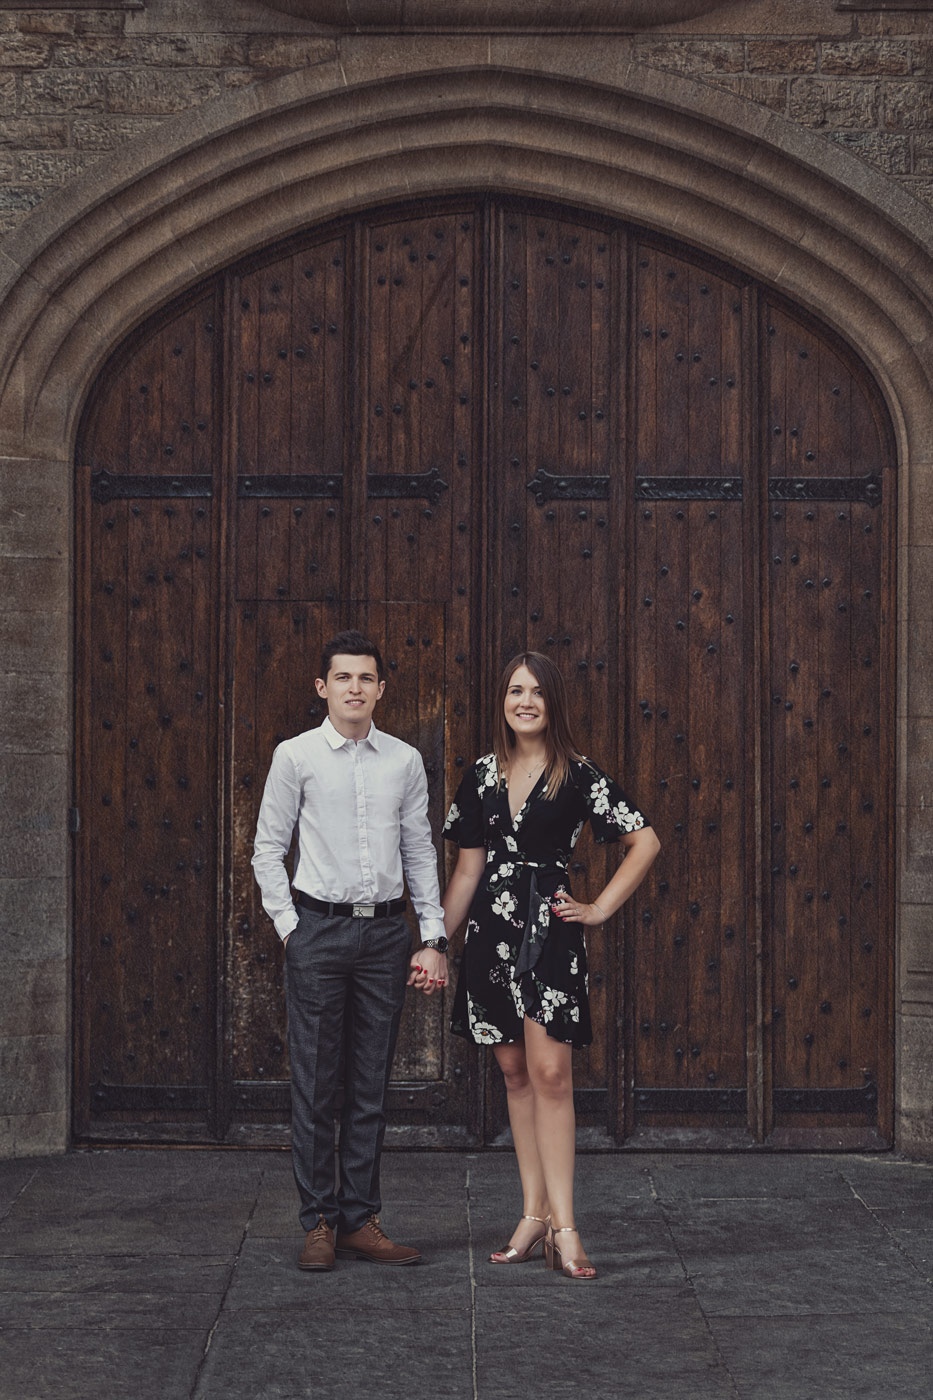 Professional Oxfordshire engagement photography